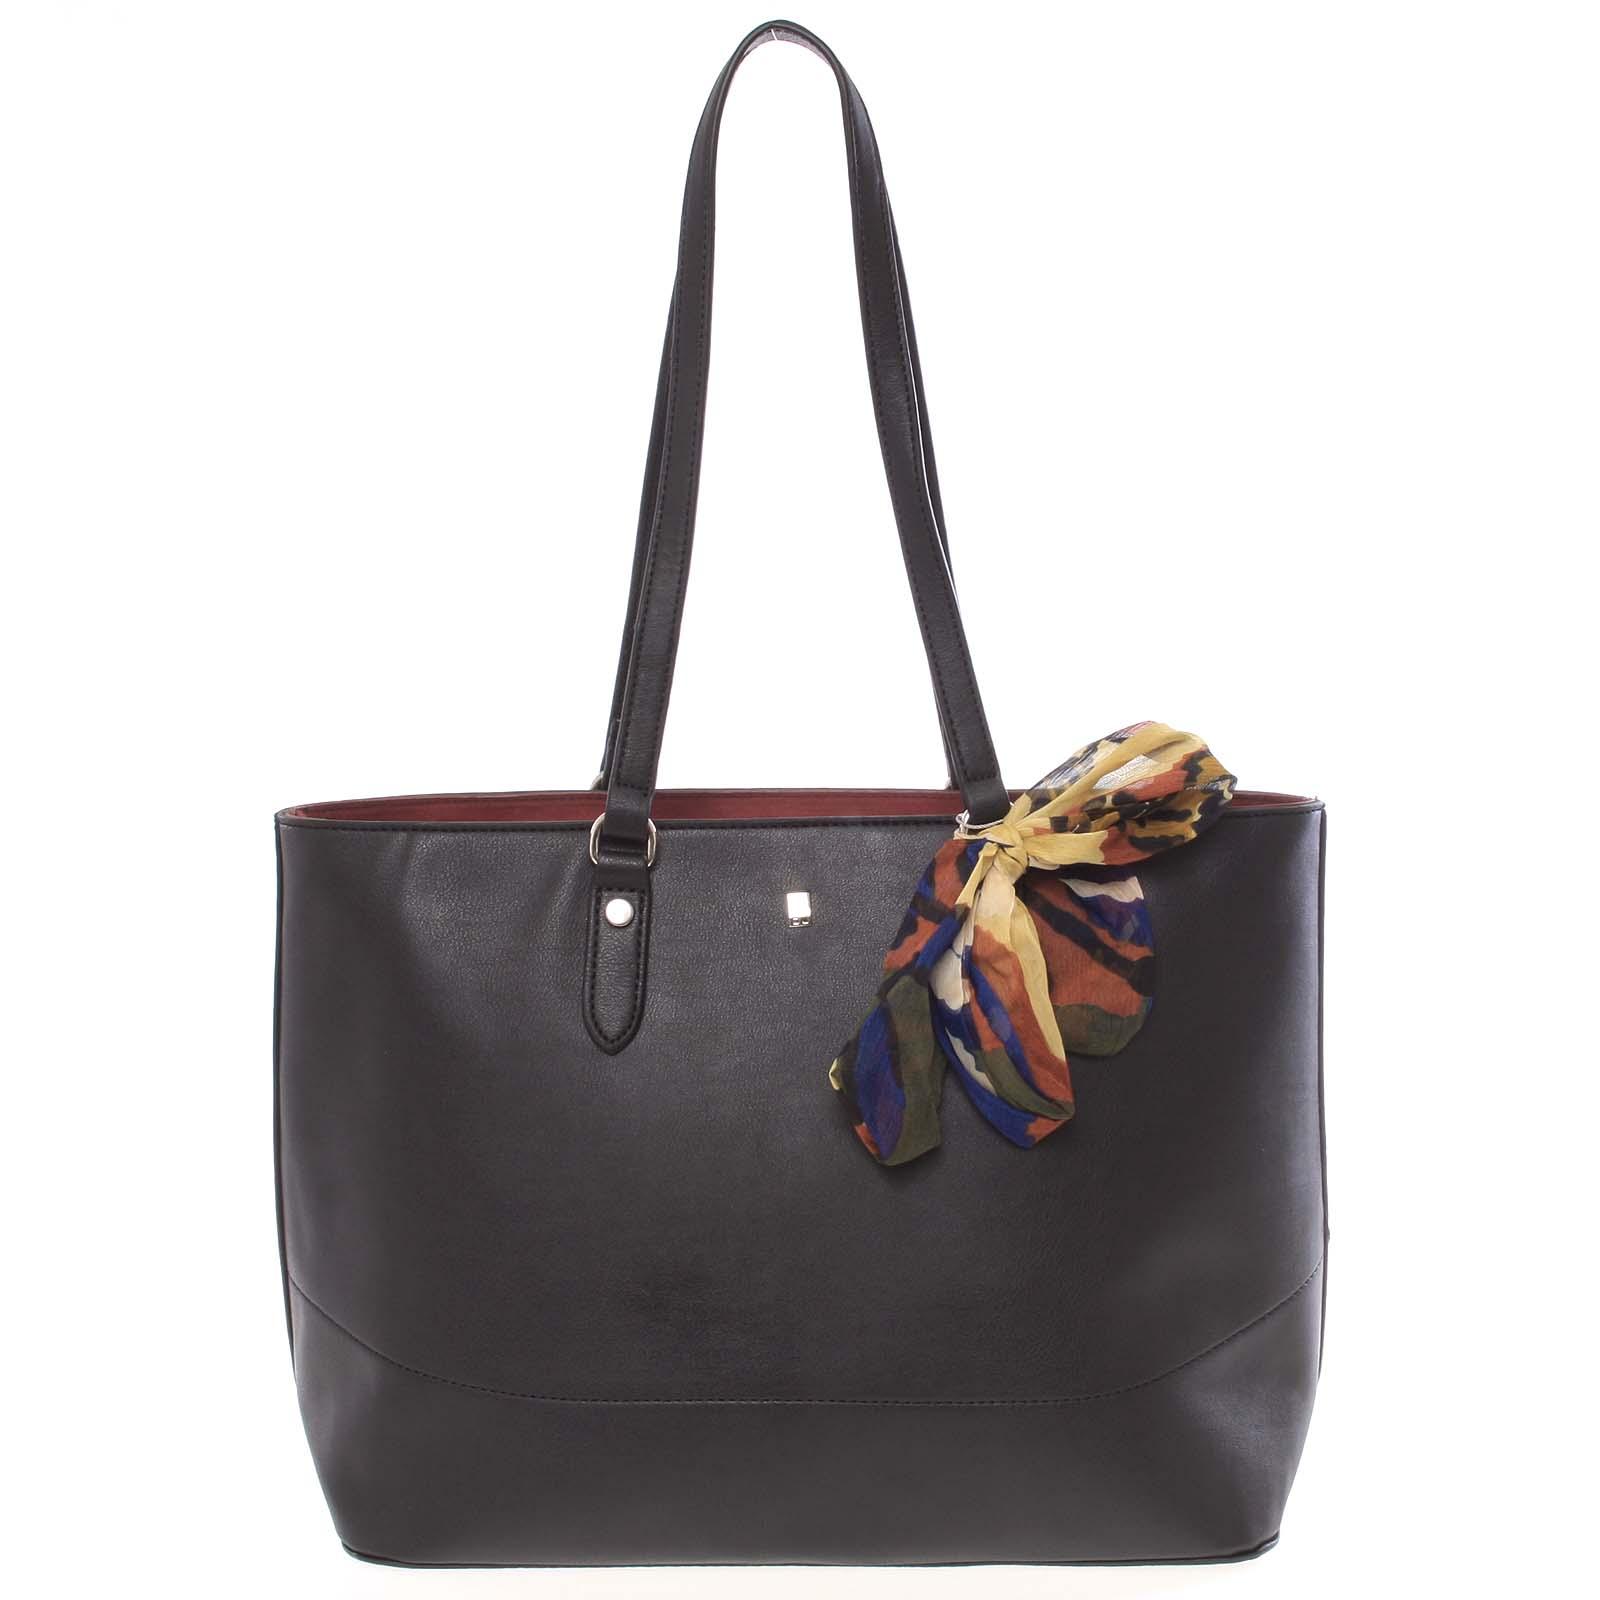 Elegantná priestranná čierna dámska kabelka cez rameno - David Jones Abdera čierna